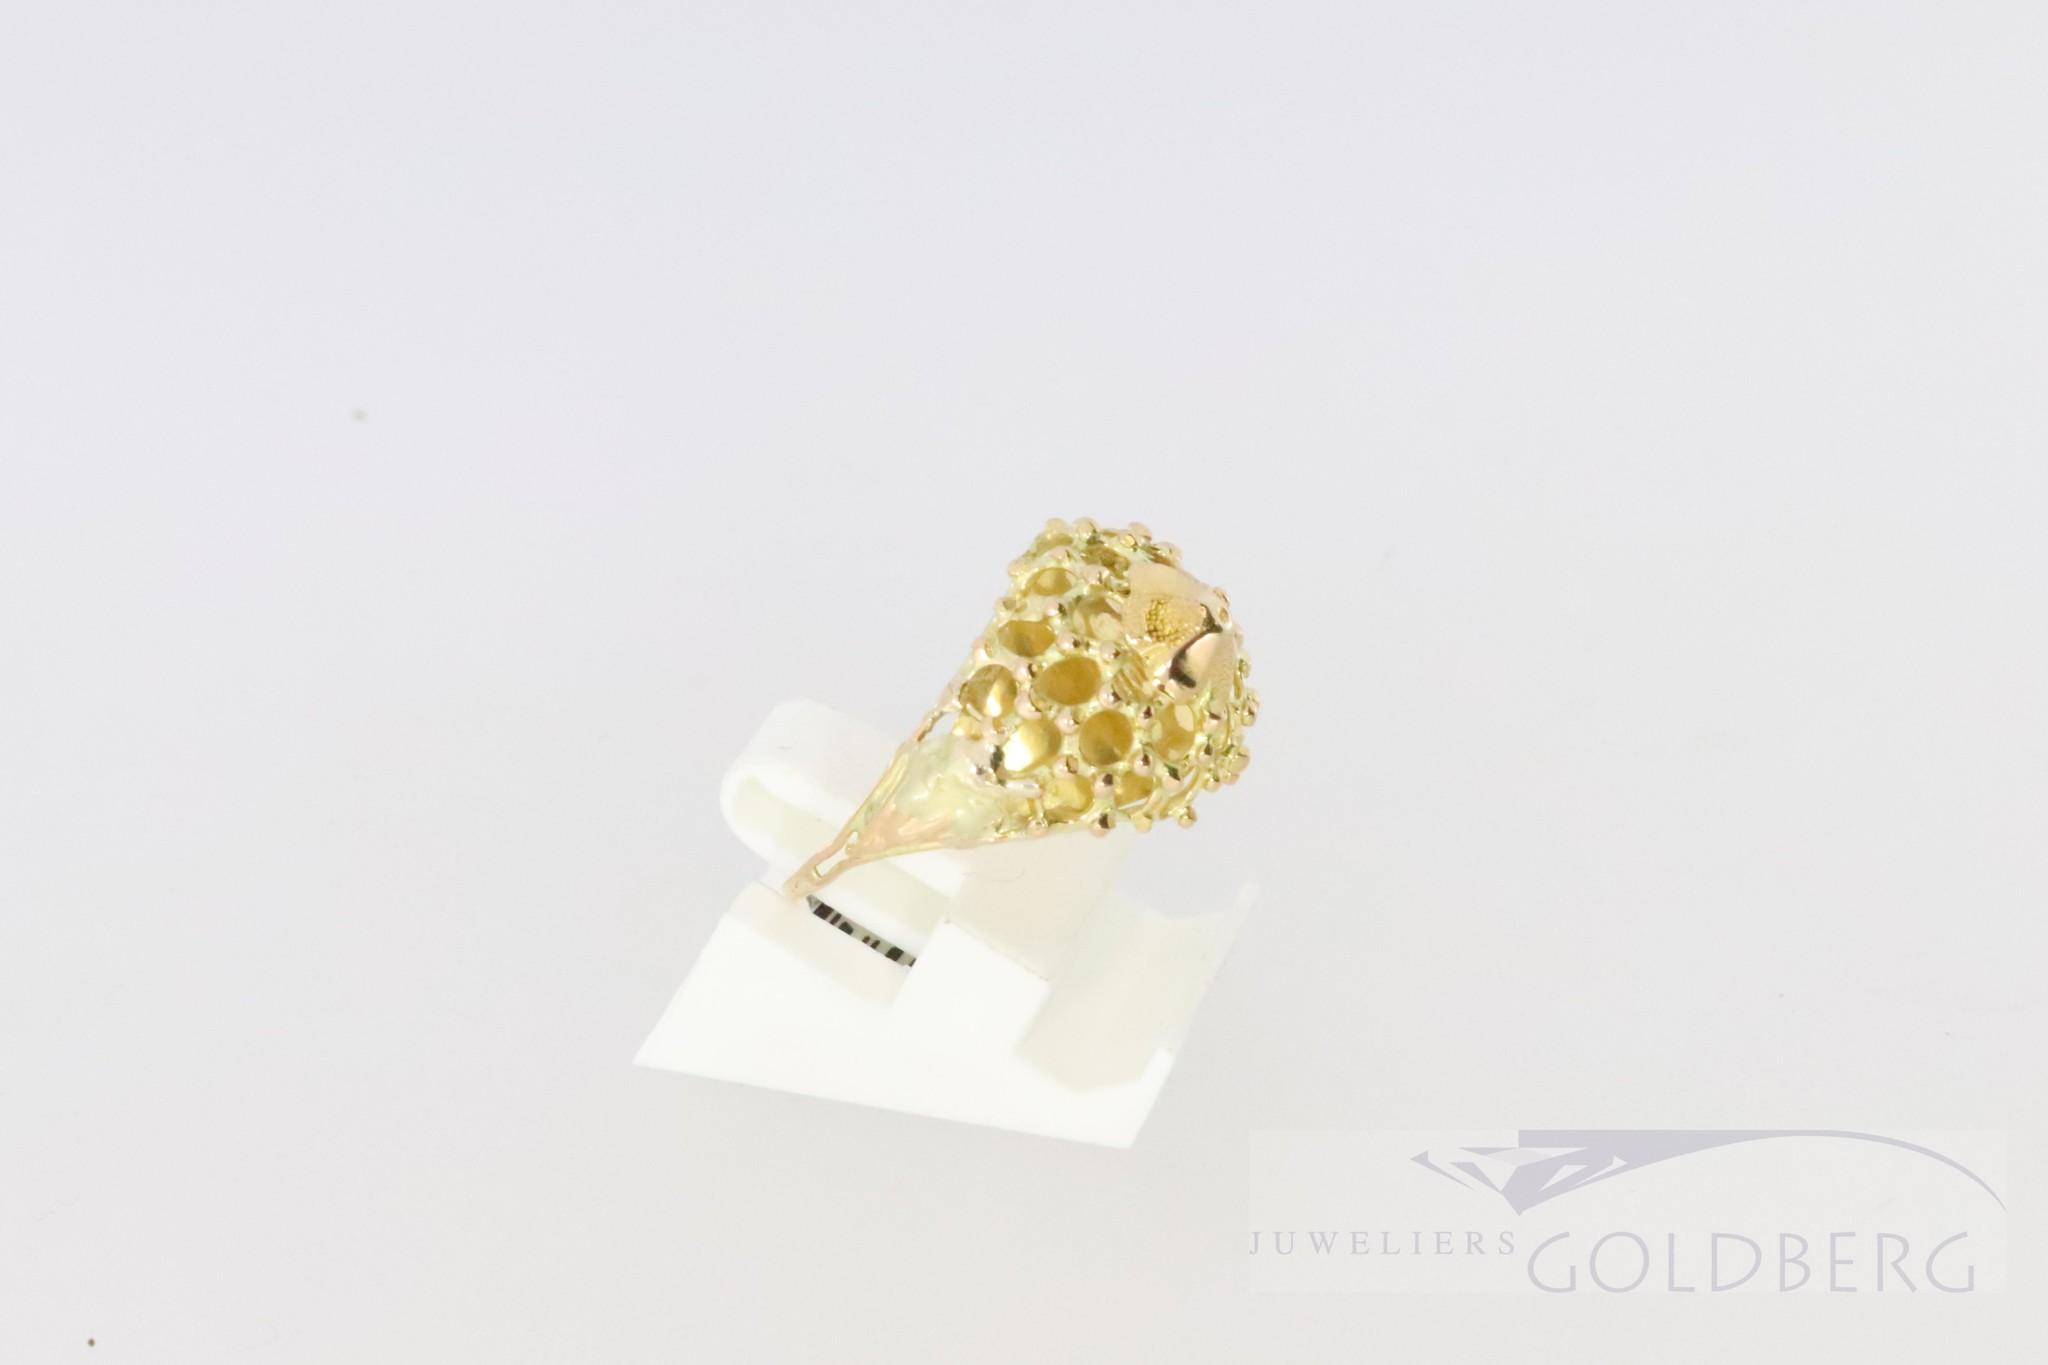 18k filligrain ring